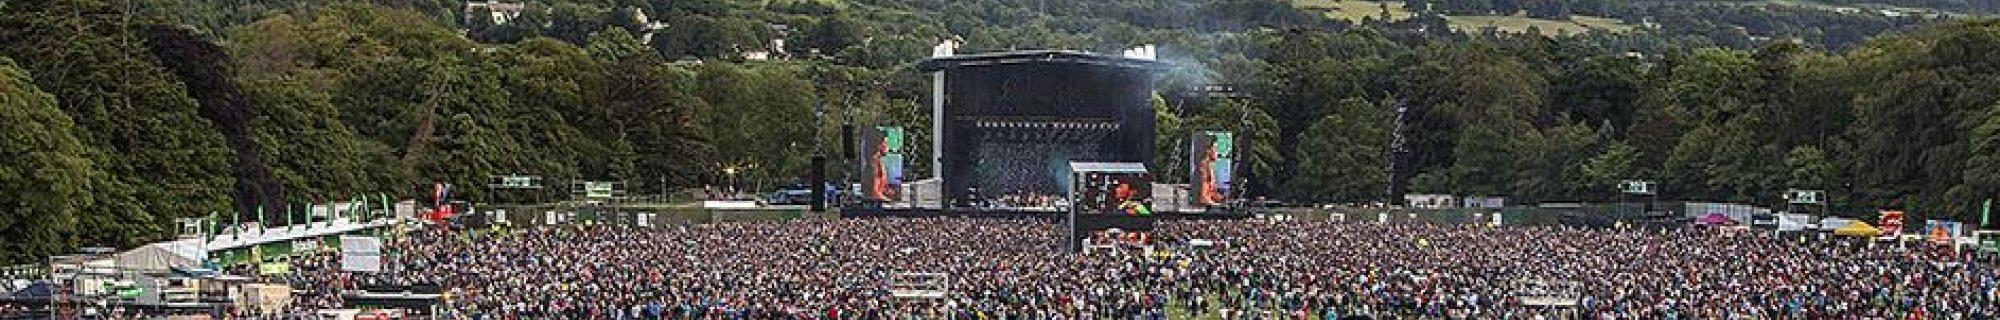 Marlay Concerts Photograph